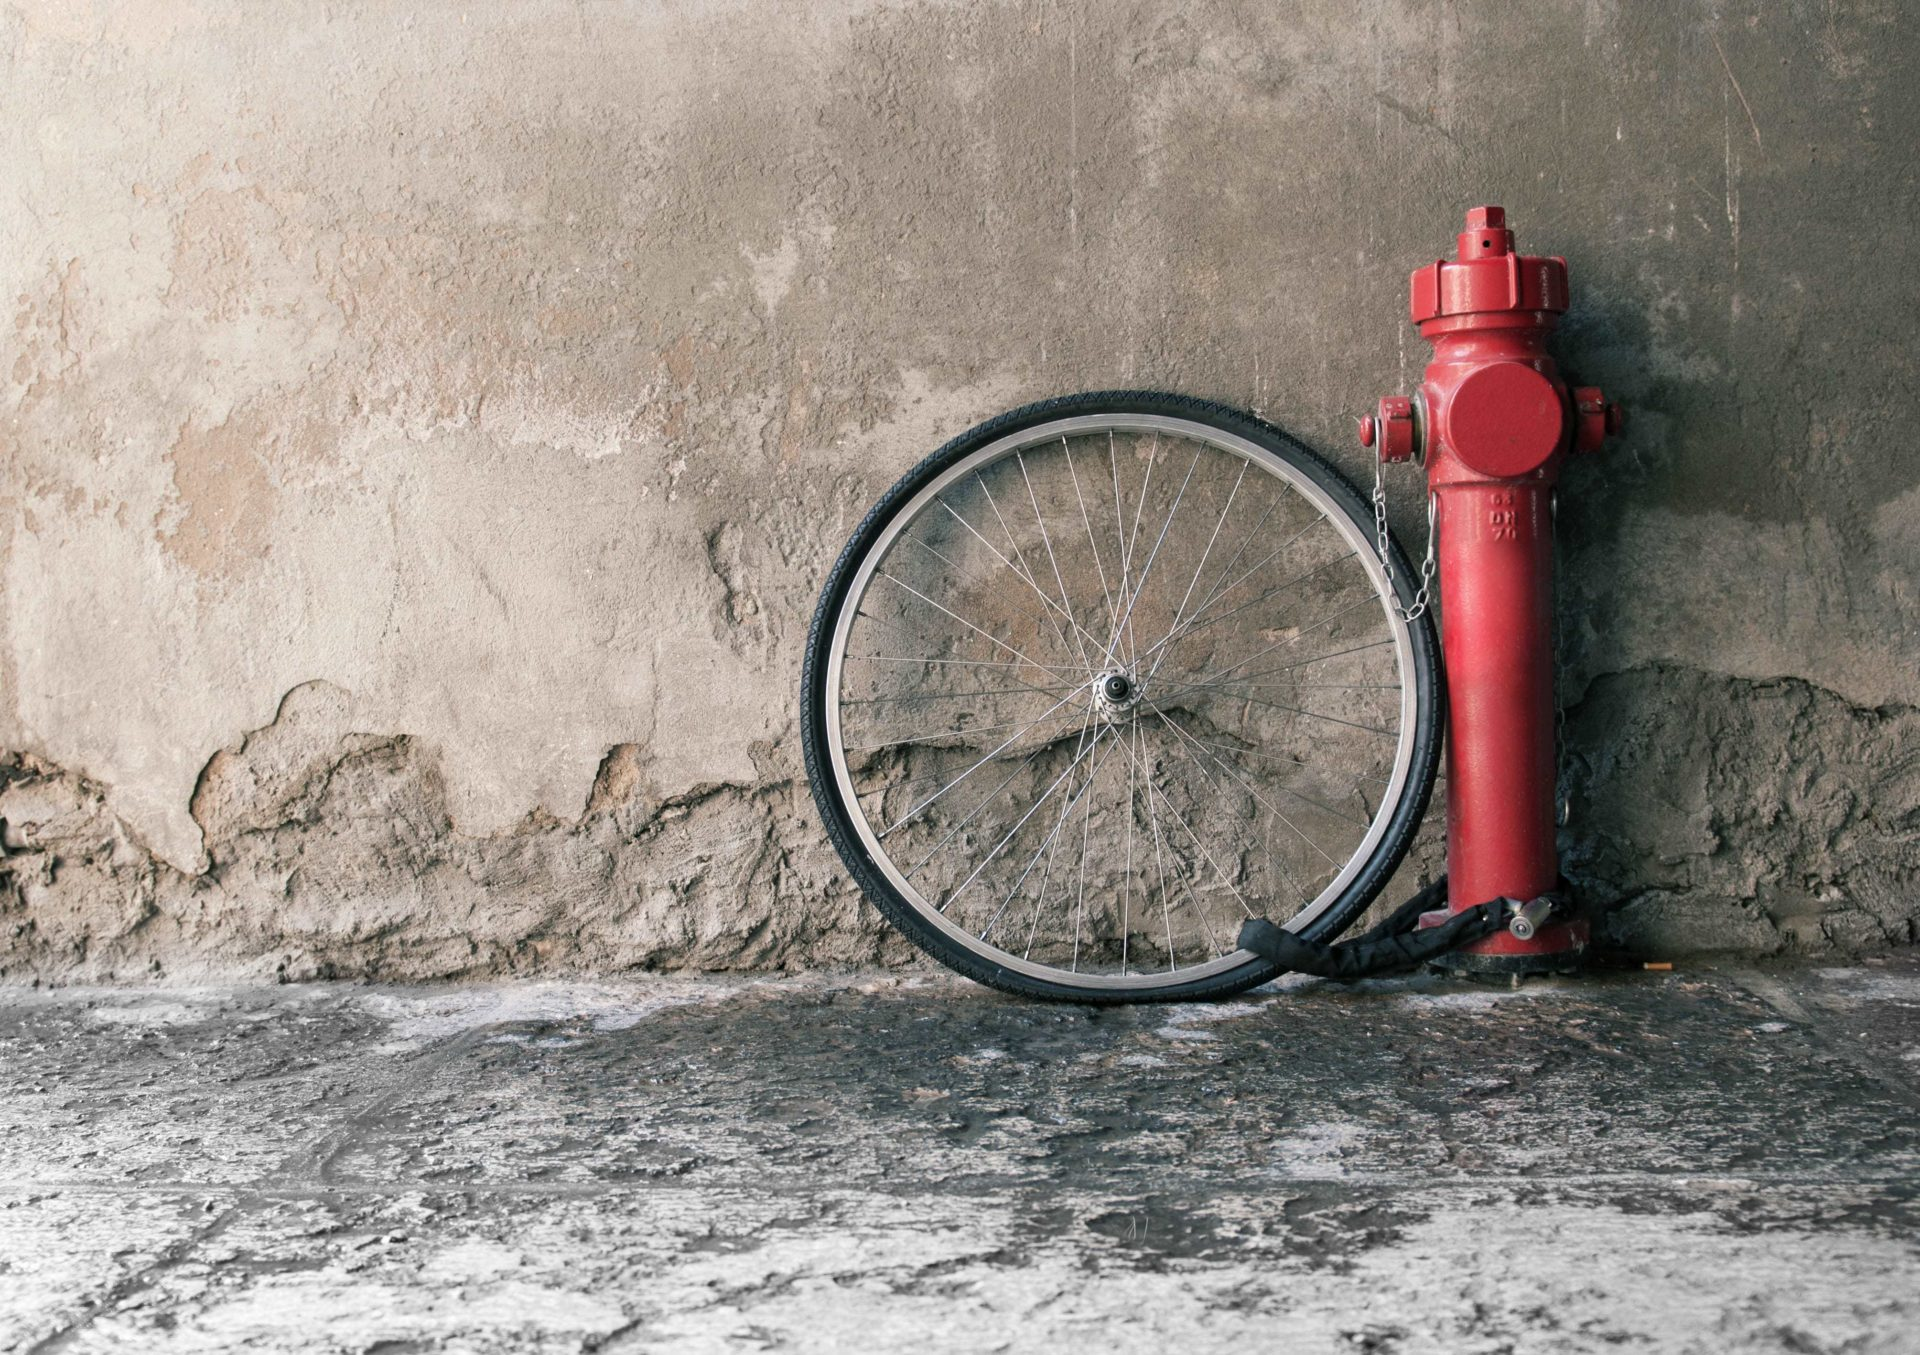 seguro de bicicleta protege contra furto